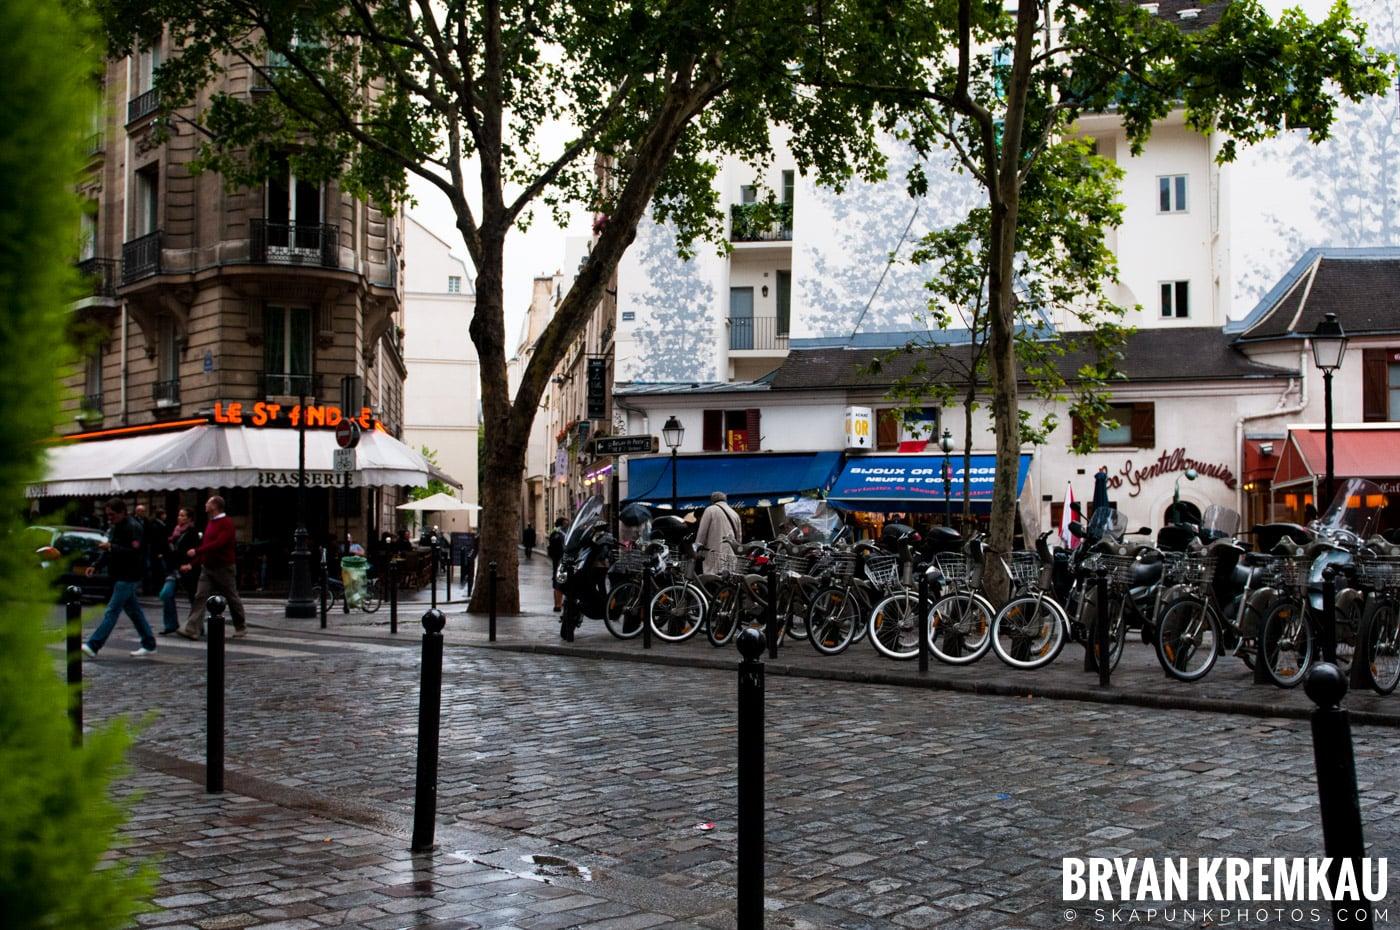 Paris, France Honeymoon - Day 3 - 7.20.11 (1)